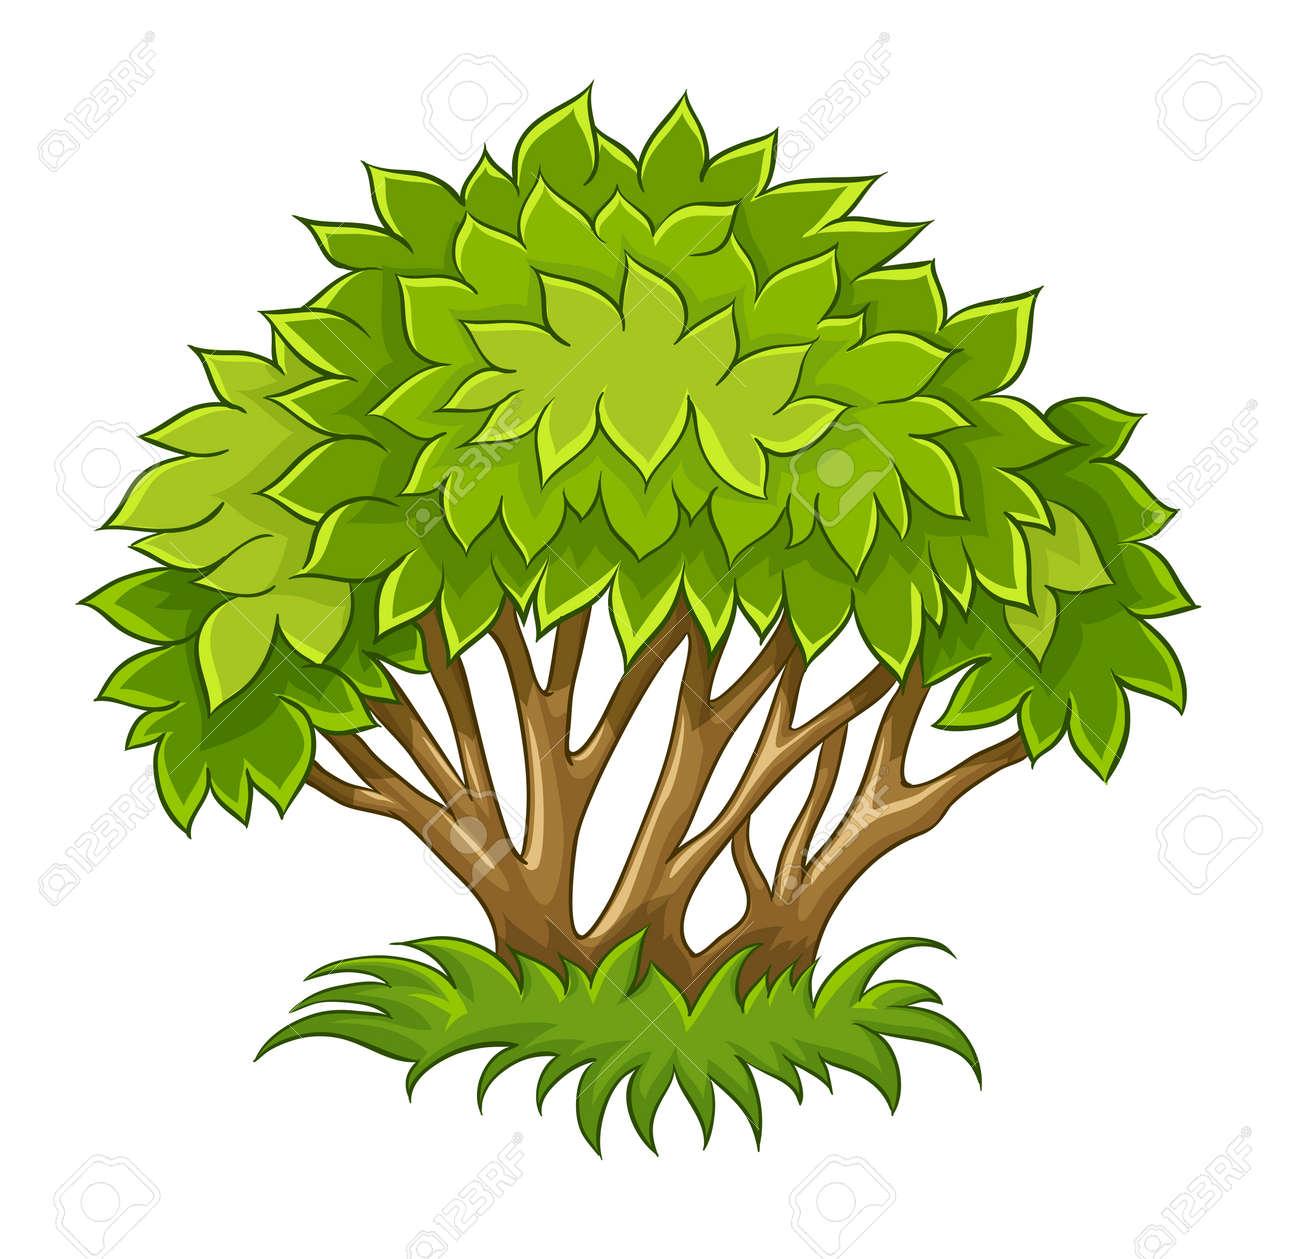 17 852 shrub stock vector illustration and royalty free shrub clipart rh 123rf com bush clipart vector shrub clip art black and white